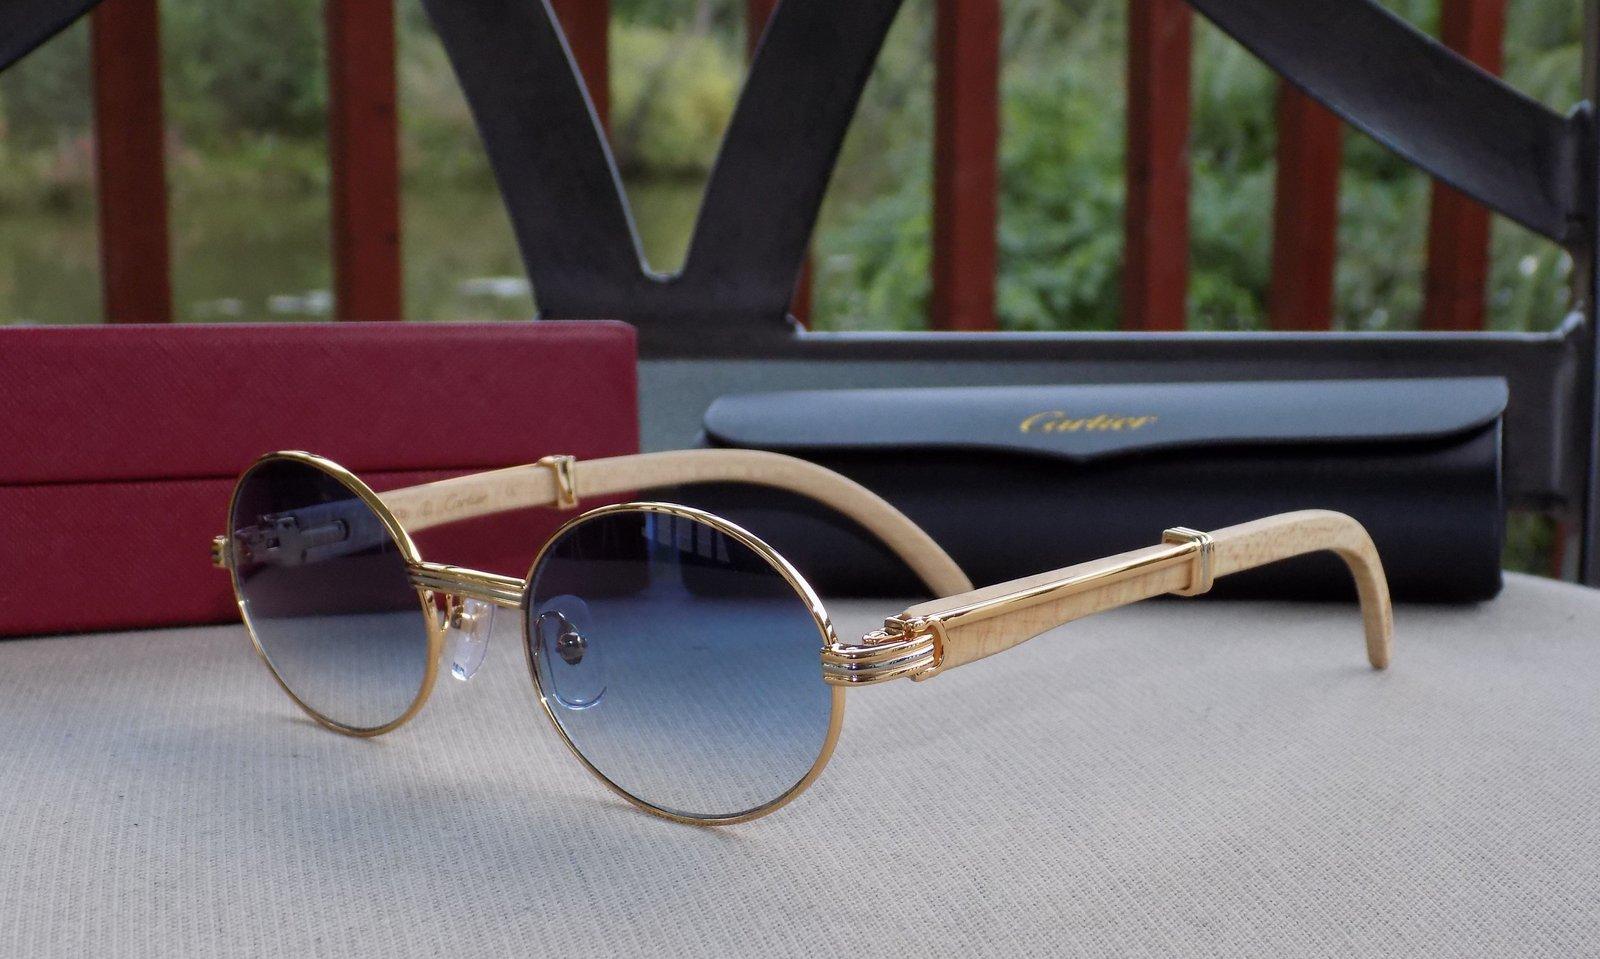 40db00102af1 Dscn3307. Dscn3307. Previous. Cartier Smooth Tulip Whitewood Blue Lens Buffalo  C Décor Sunglasses